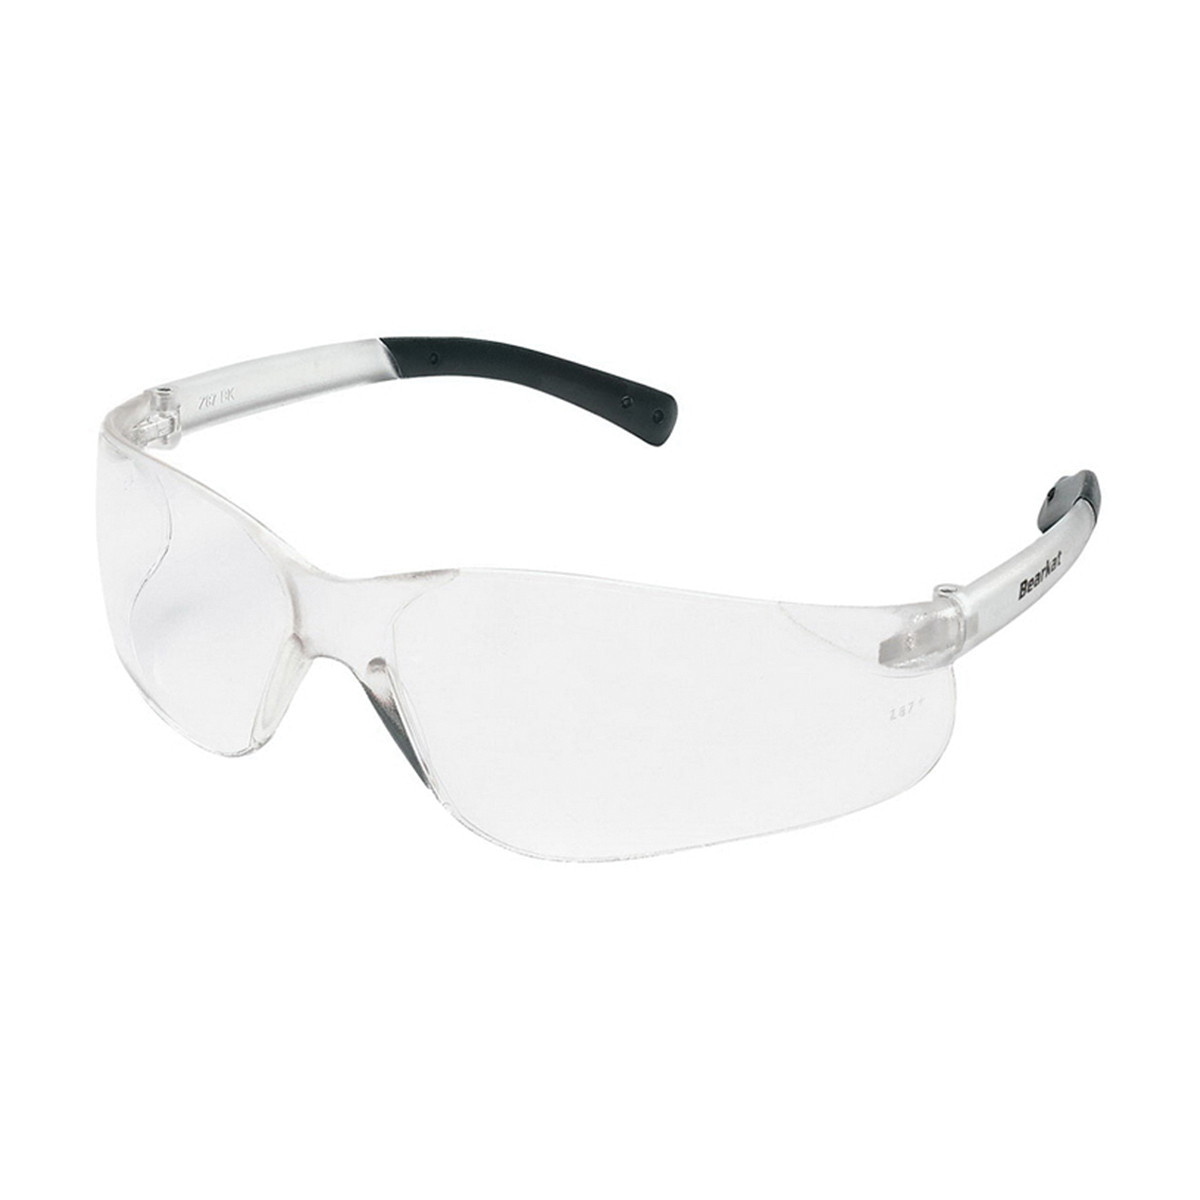 MCR Safety BearKat® BK1 Series Safety Glasses, Clear Scratch Resistant Lens